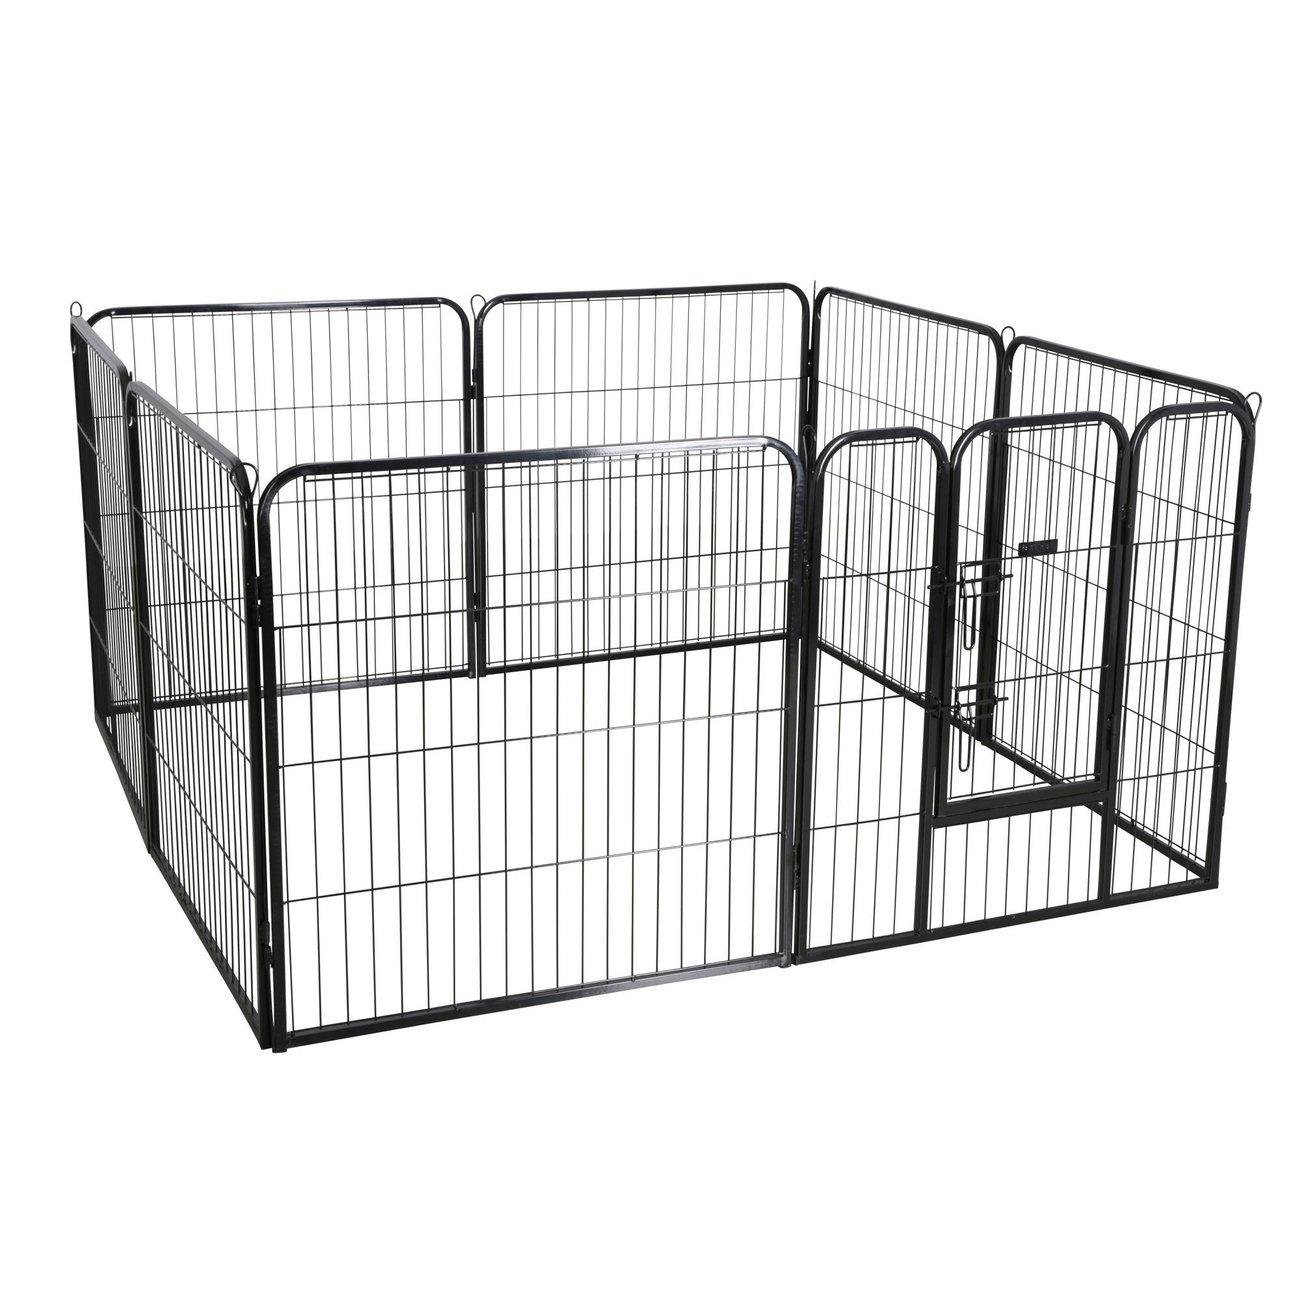 Kerbl Hunde- und Welpengehege Preview Image